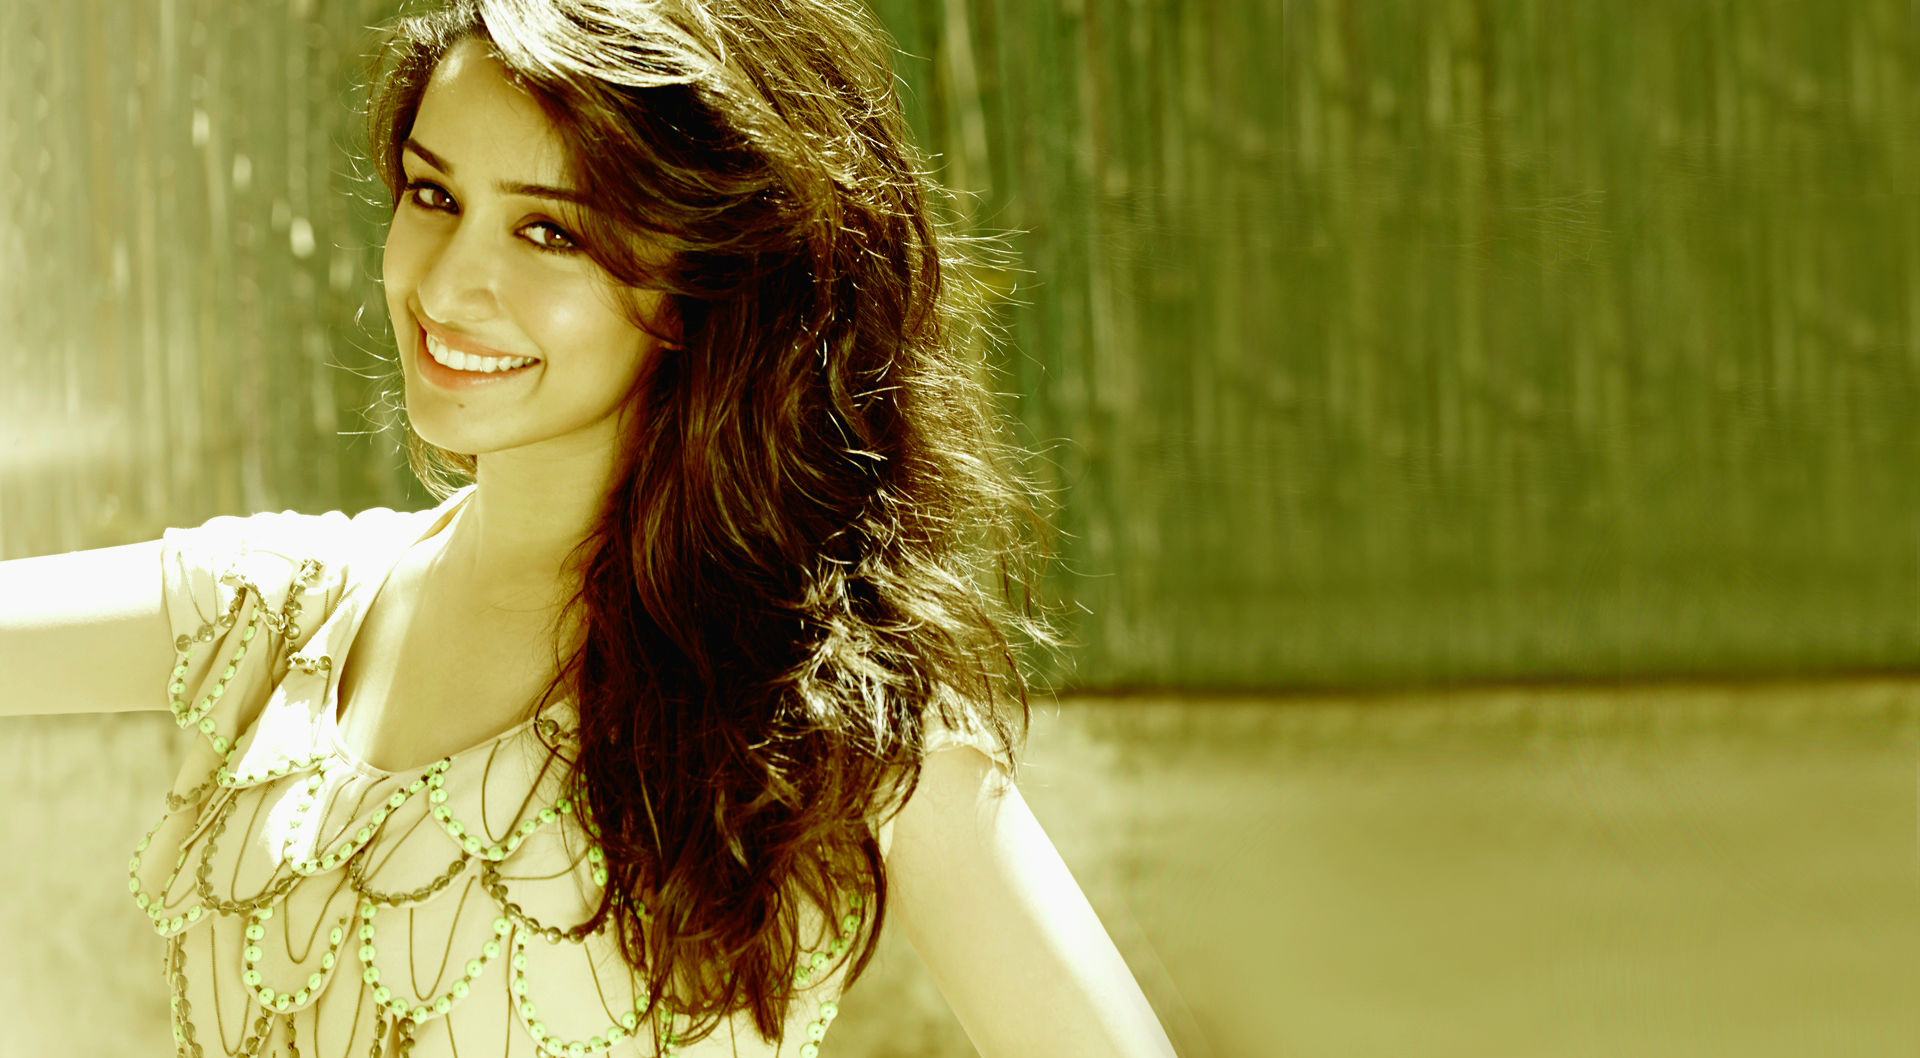 Shraddha Kapoor Cute Smile • PoPoPics.com